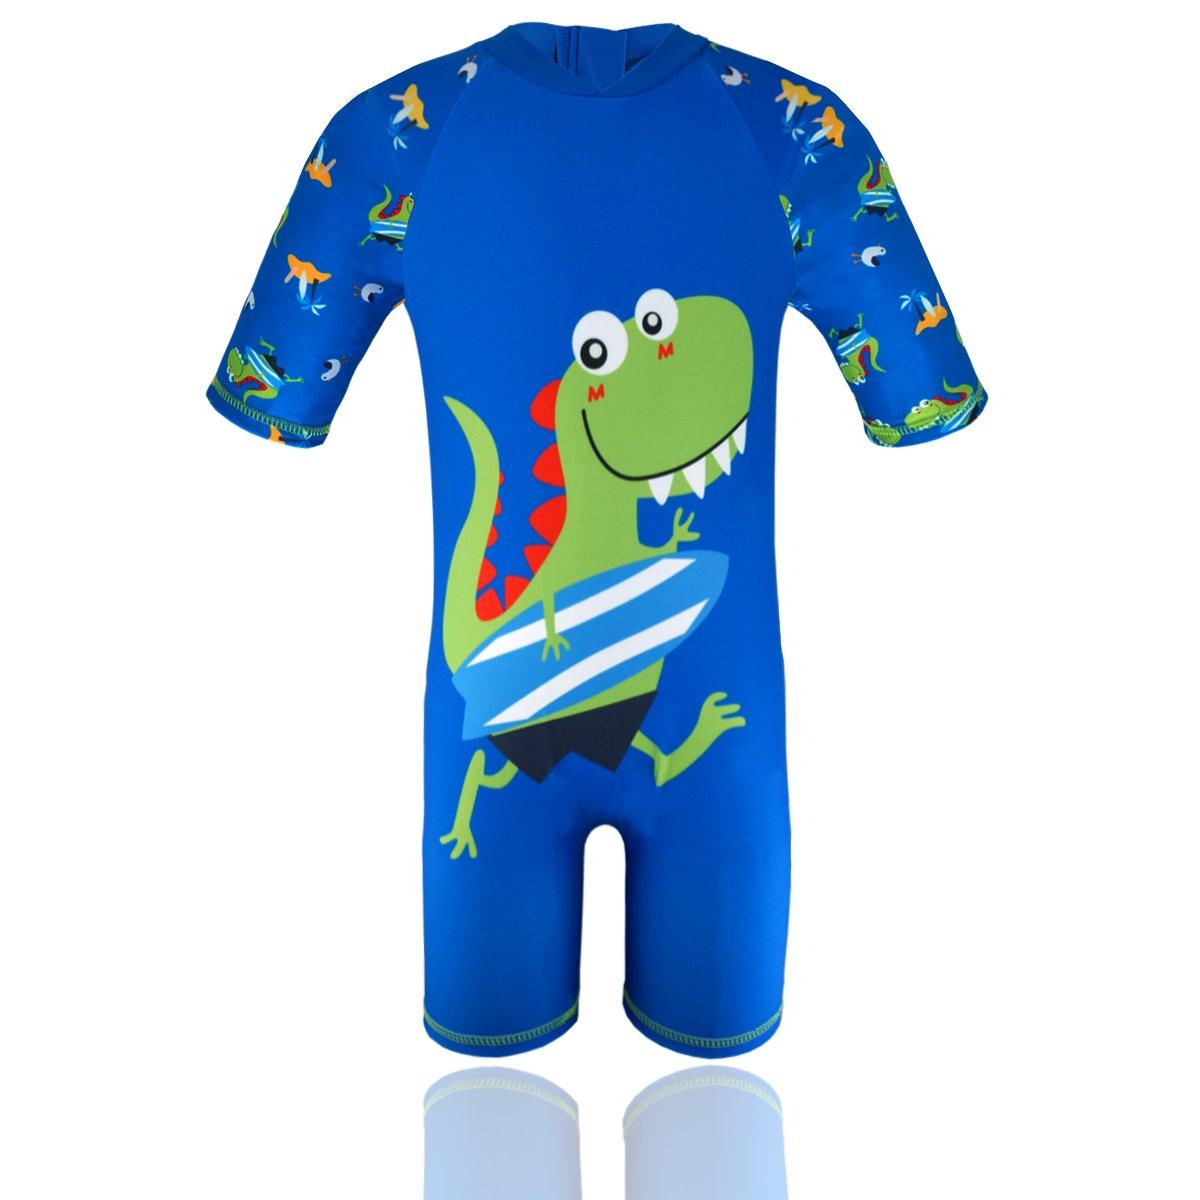 HONISEN Boys One Piece Rash Guard Swimsuits Kids Sunsuit Swimwear UPF 50+